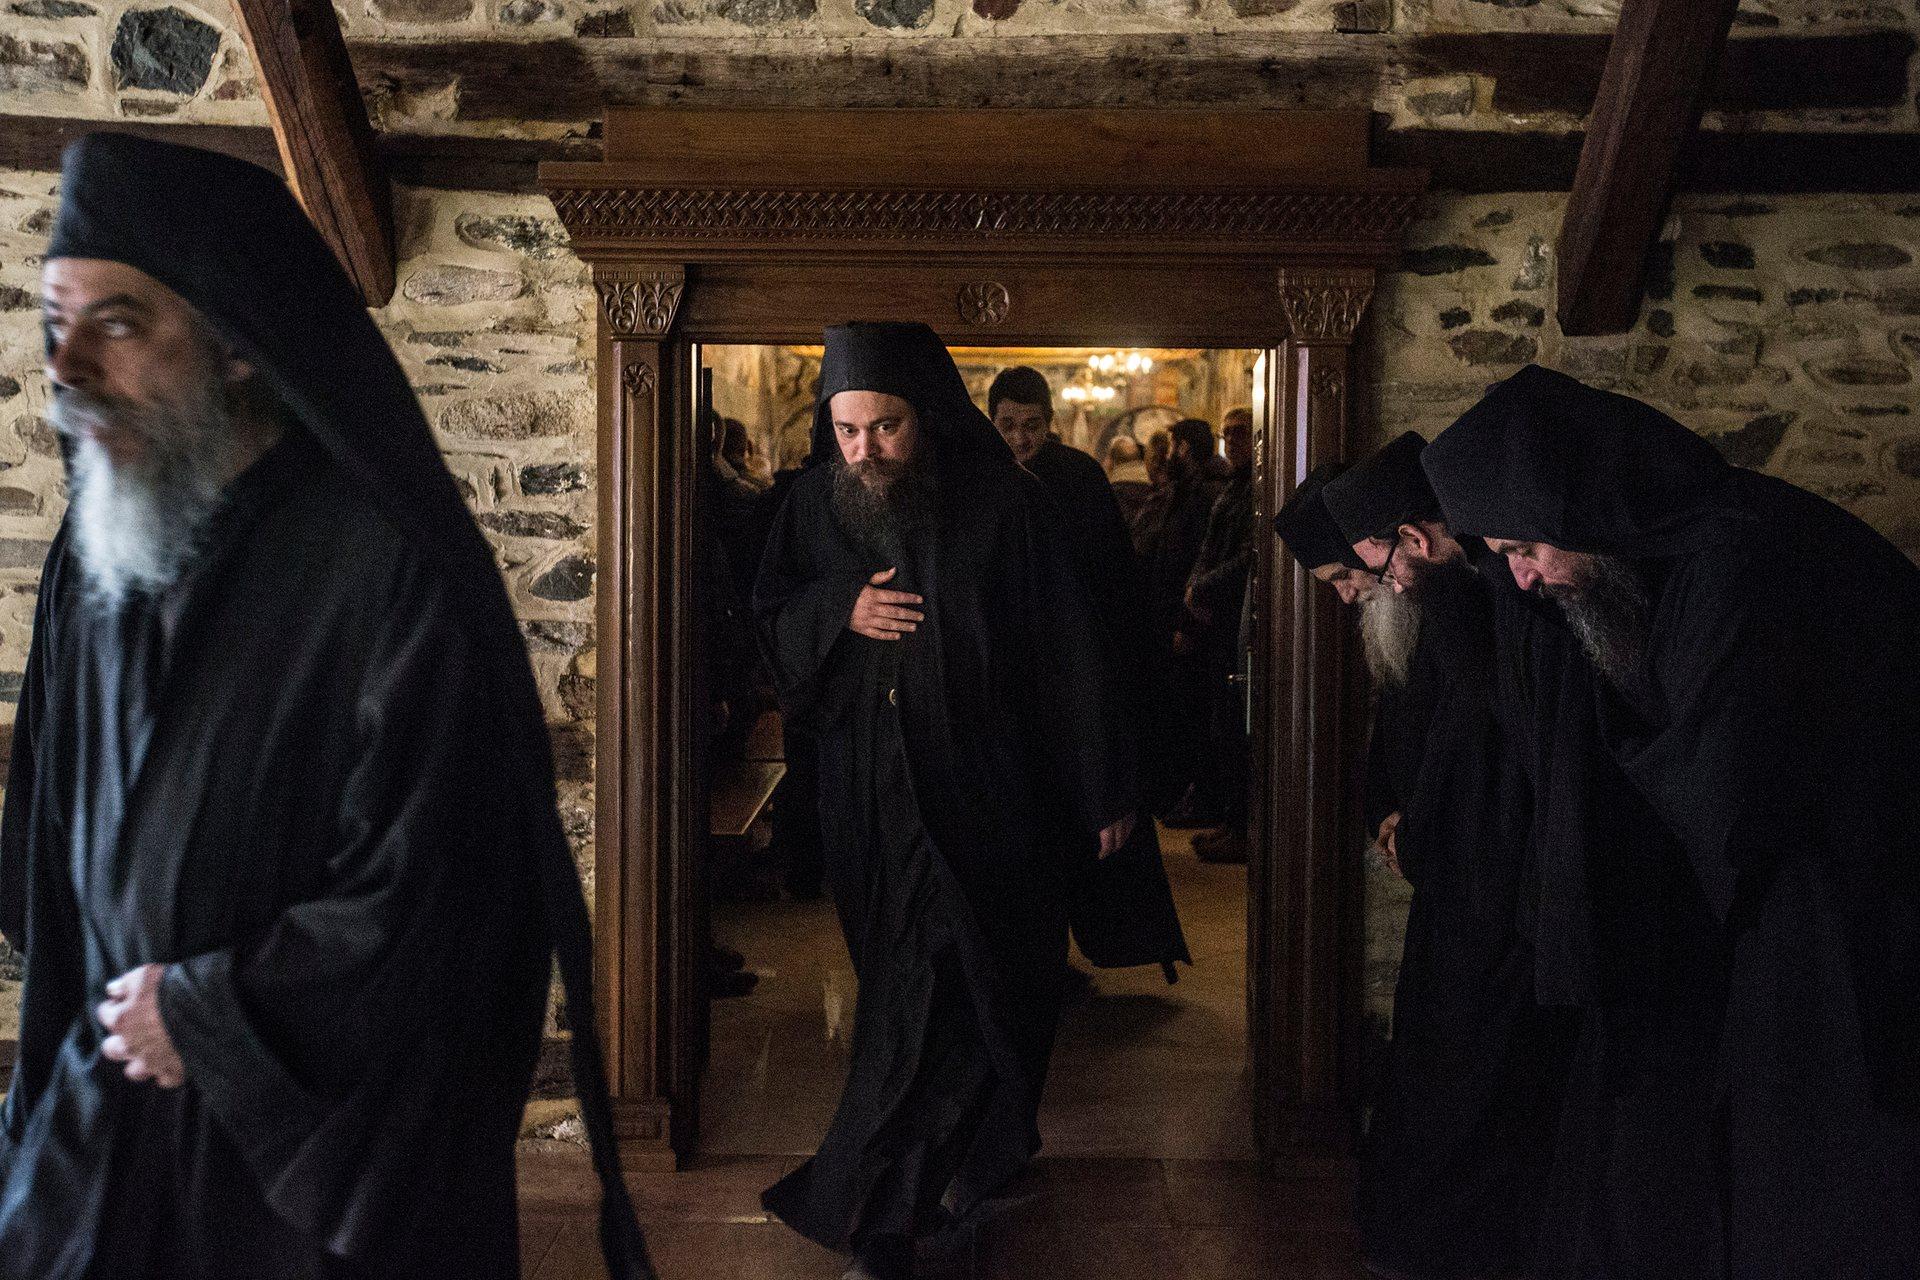 Guardian photo-essay on Mount Athos, the Holy Mountain